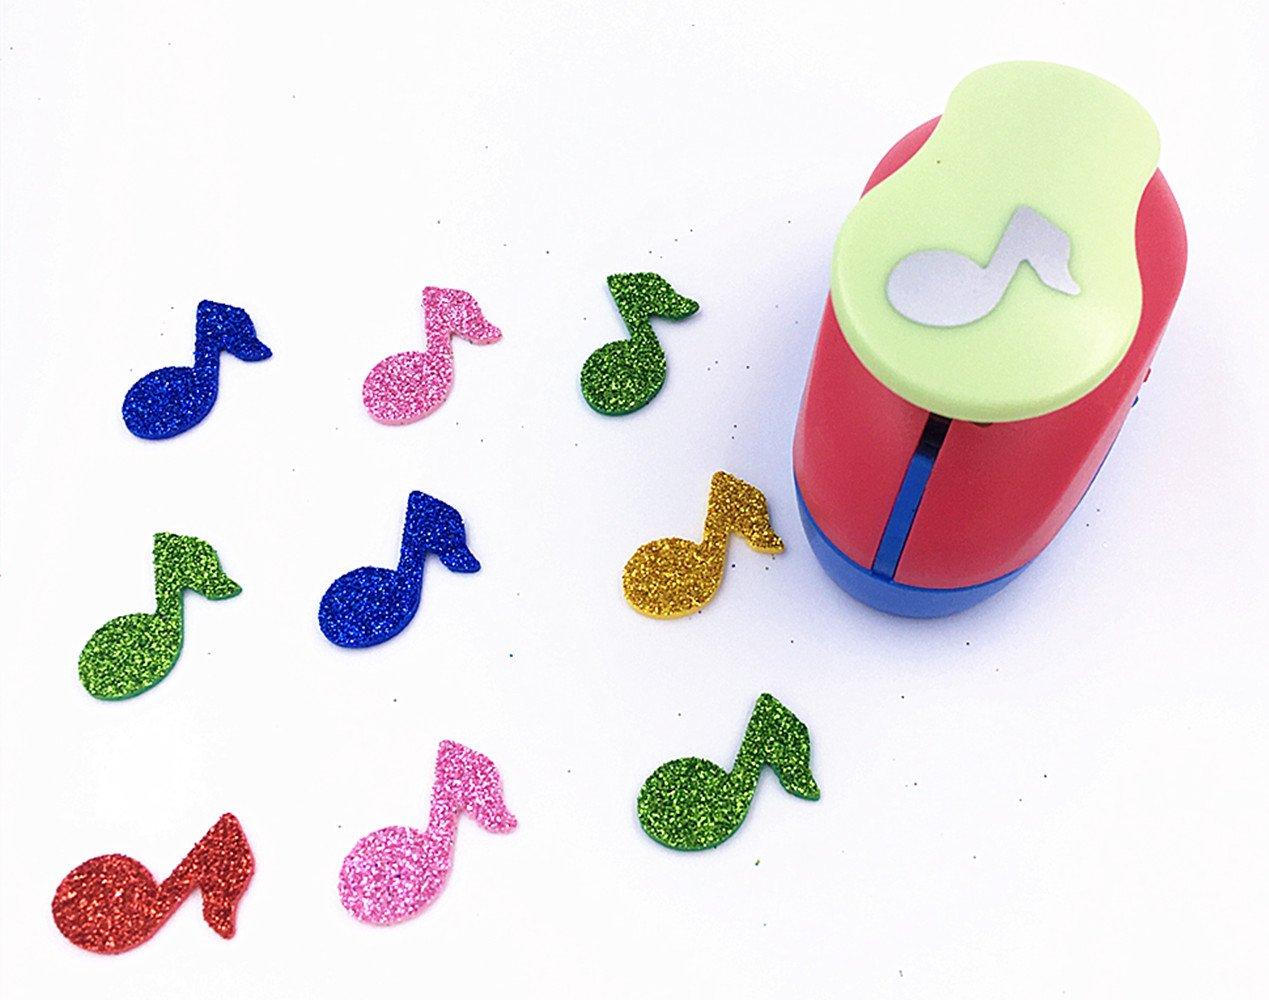 "Snowflake TECH-P Creative Life Size 1/"" Multi-Pattern Hand Press Album Cards Paper Craft Punch,Card Scrapbooking Engraving Kid Cut DIY Handmade Hole Puncher."